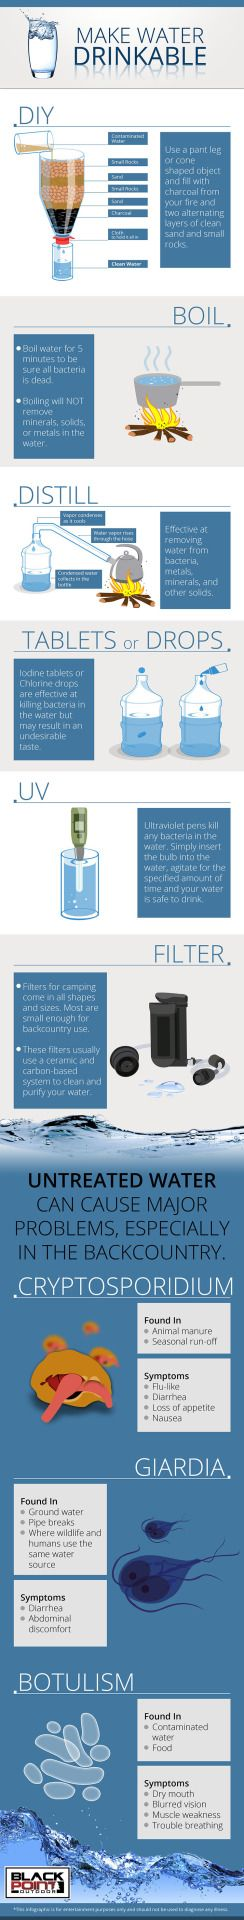 #diy #ろ過装置 #water drinkable #(Via:  Make Water Drinkable  )いざという時のために覚えておいて損はないですね。砂が必要ですね!?K砂をどうぞ!(^^)